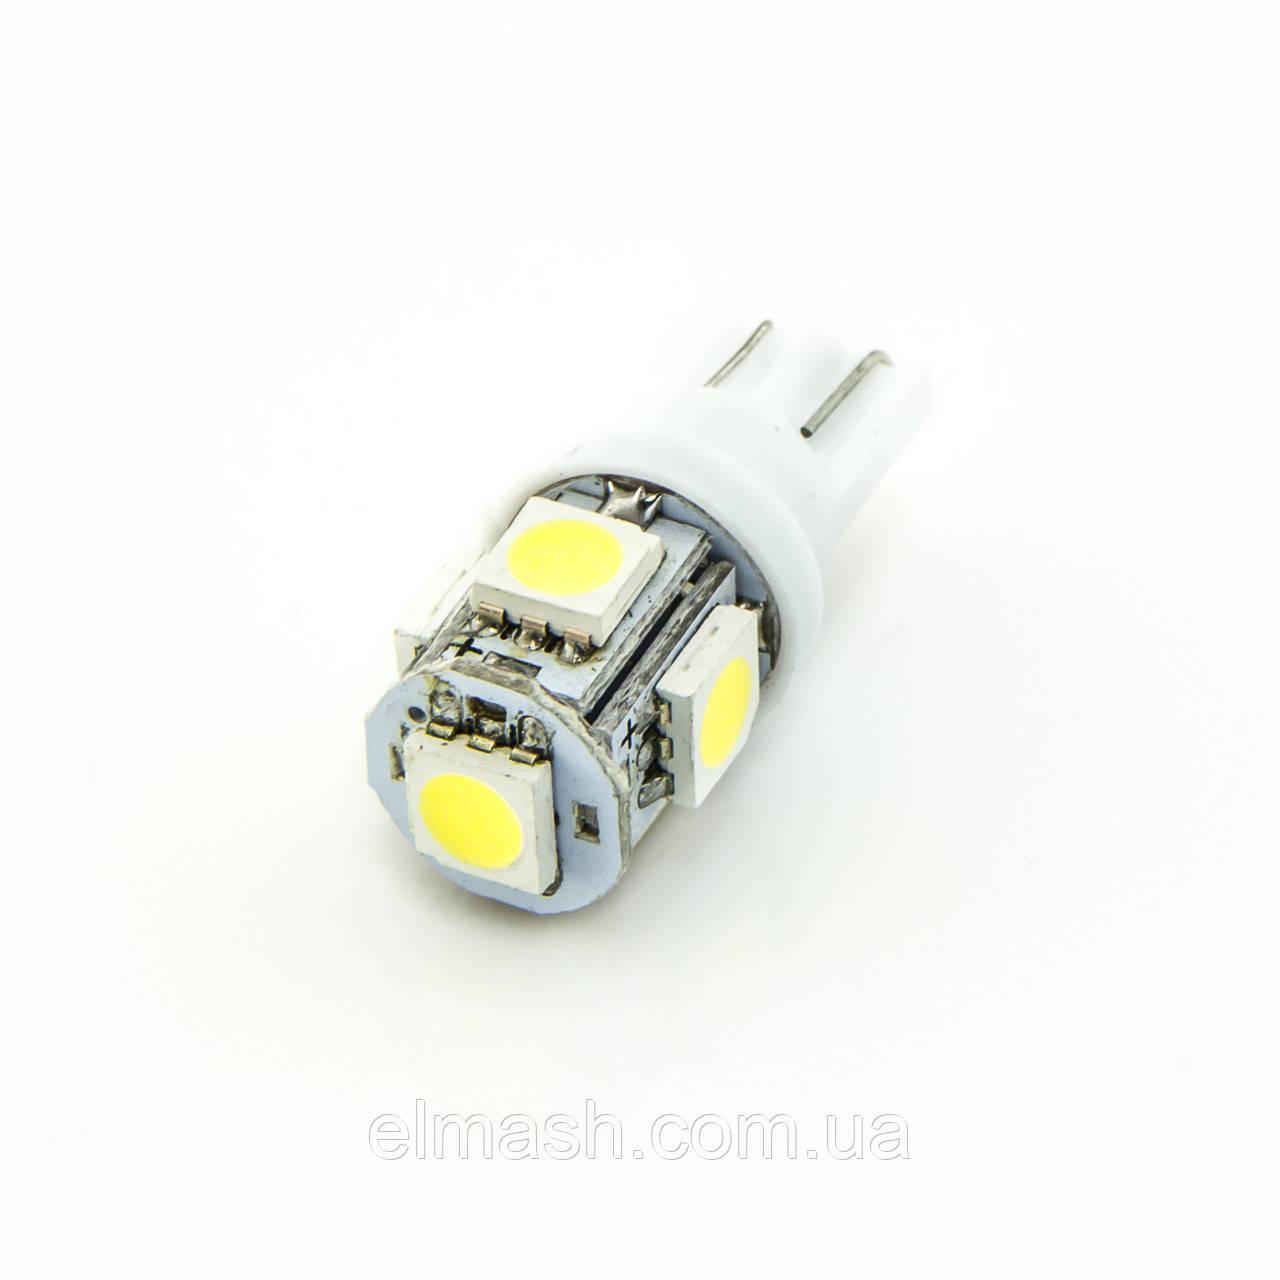 Лампа LED 12V T10 (W5W) 5SMD 5050 70Lm БЕЛЫЙ